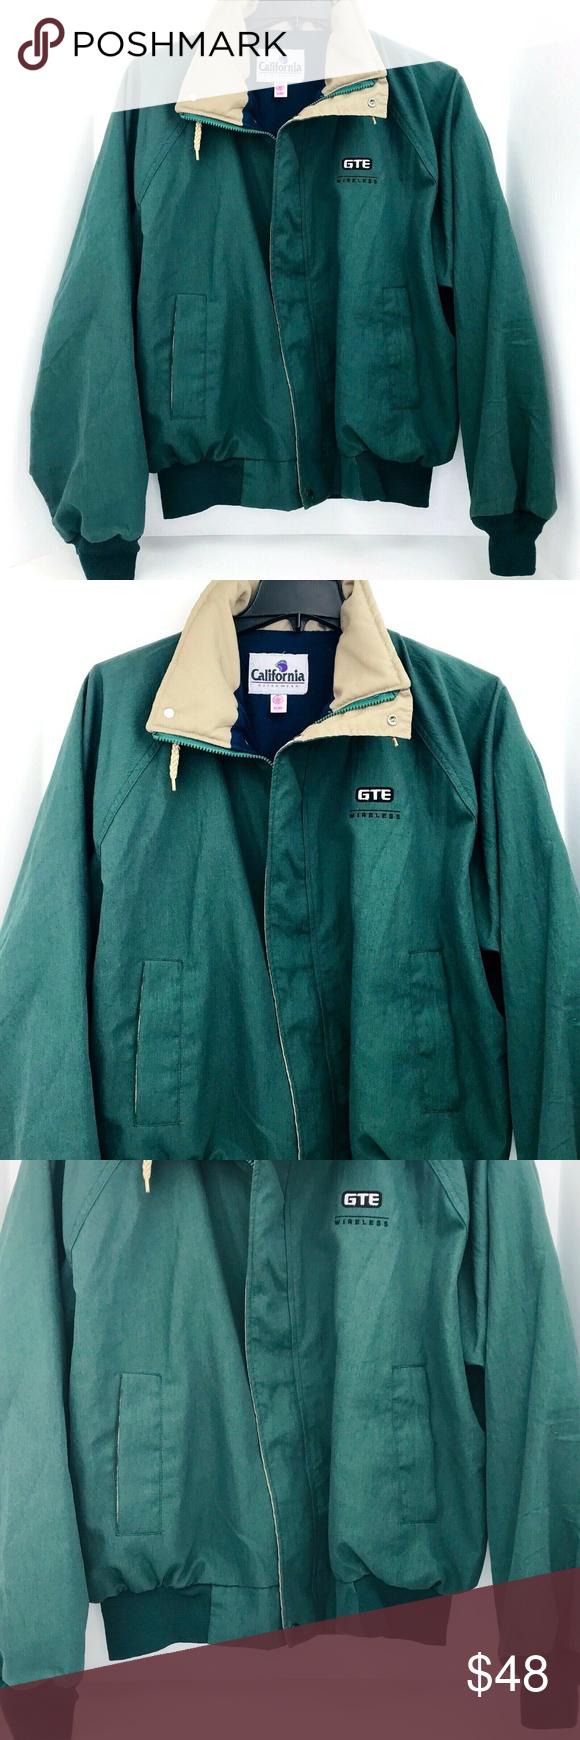 Vintage Gte Wireless Xl California Outer Wear How To Wear Outerwear Jackets Bomber Jacket [ 1740 x 580 Pixel ]